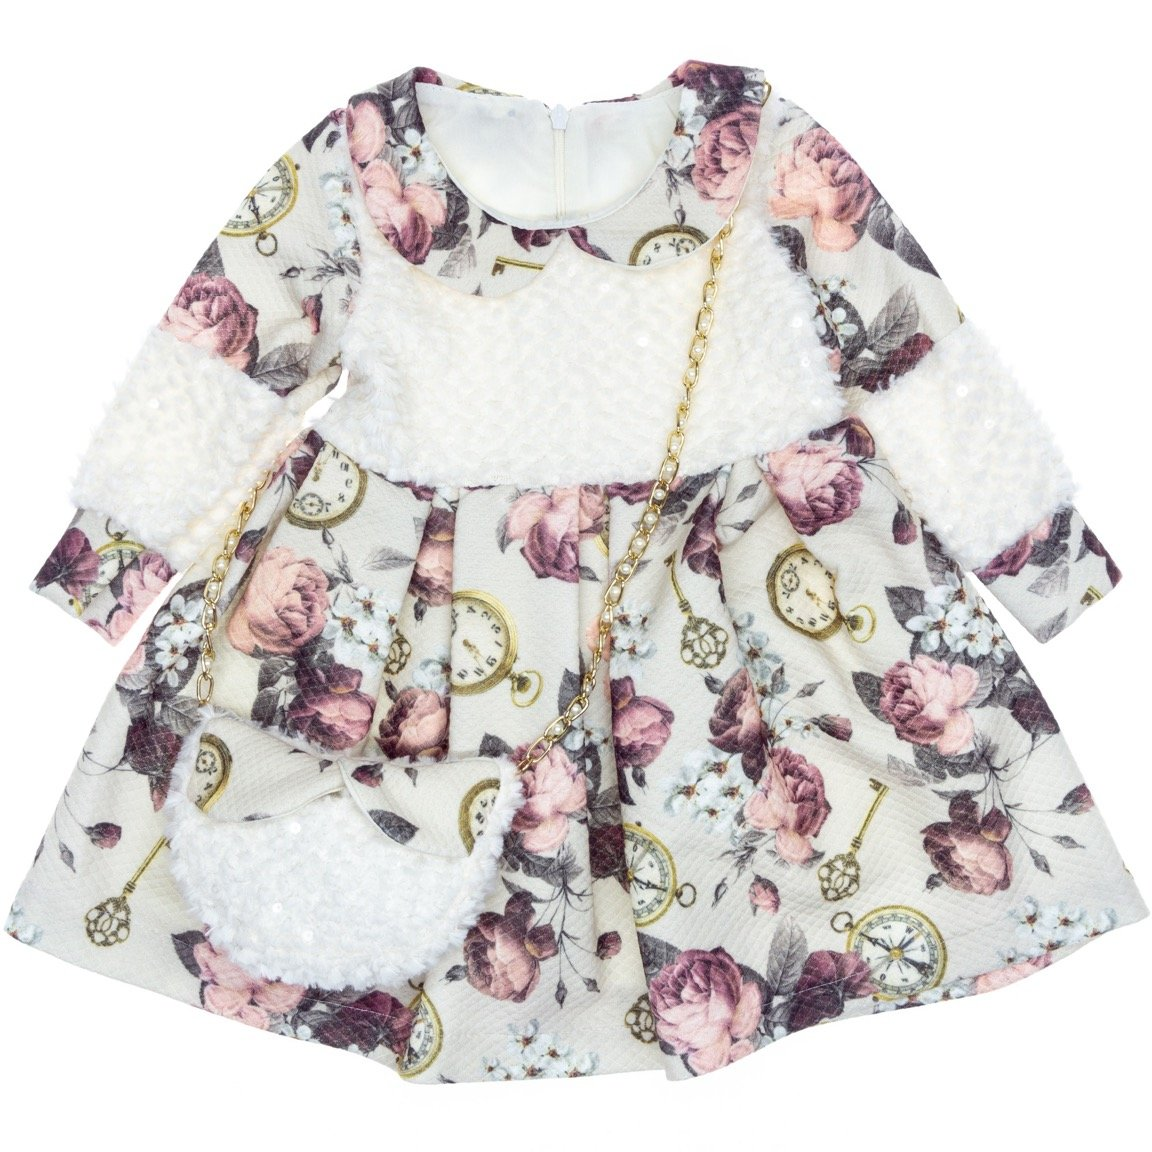 A.Y.D. παιδικό αμπιγιέ φόρεμα & τσαντάκι «Time»